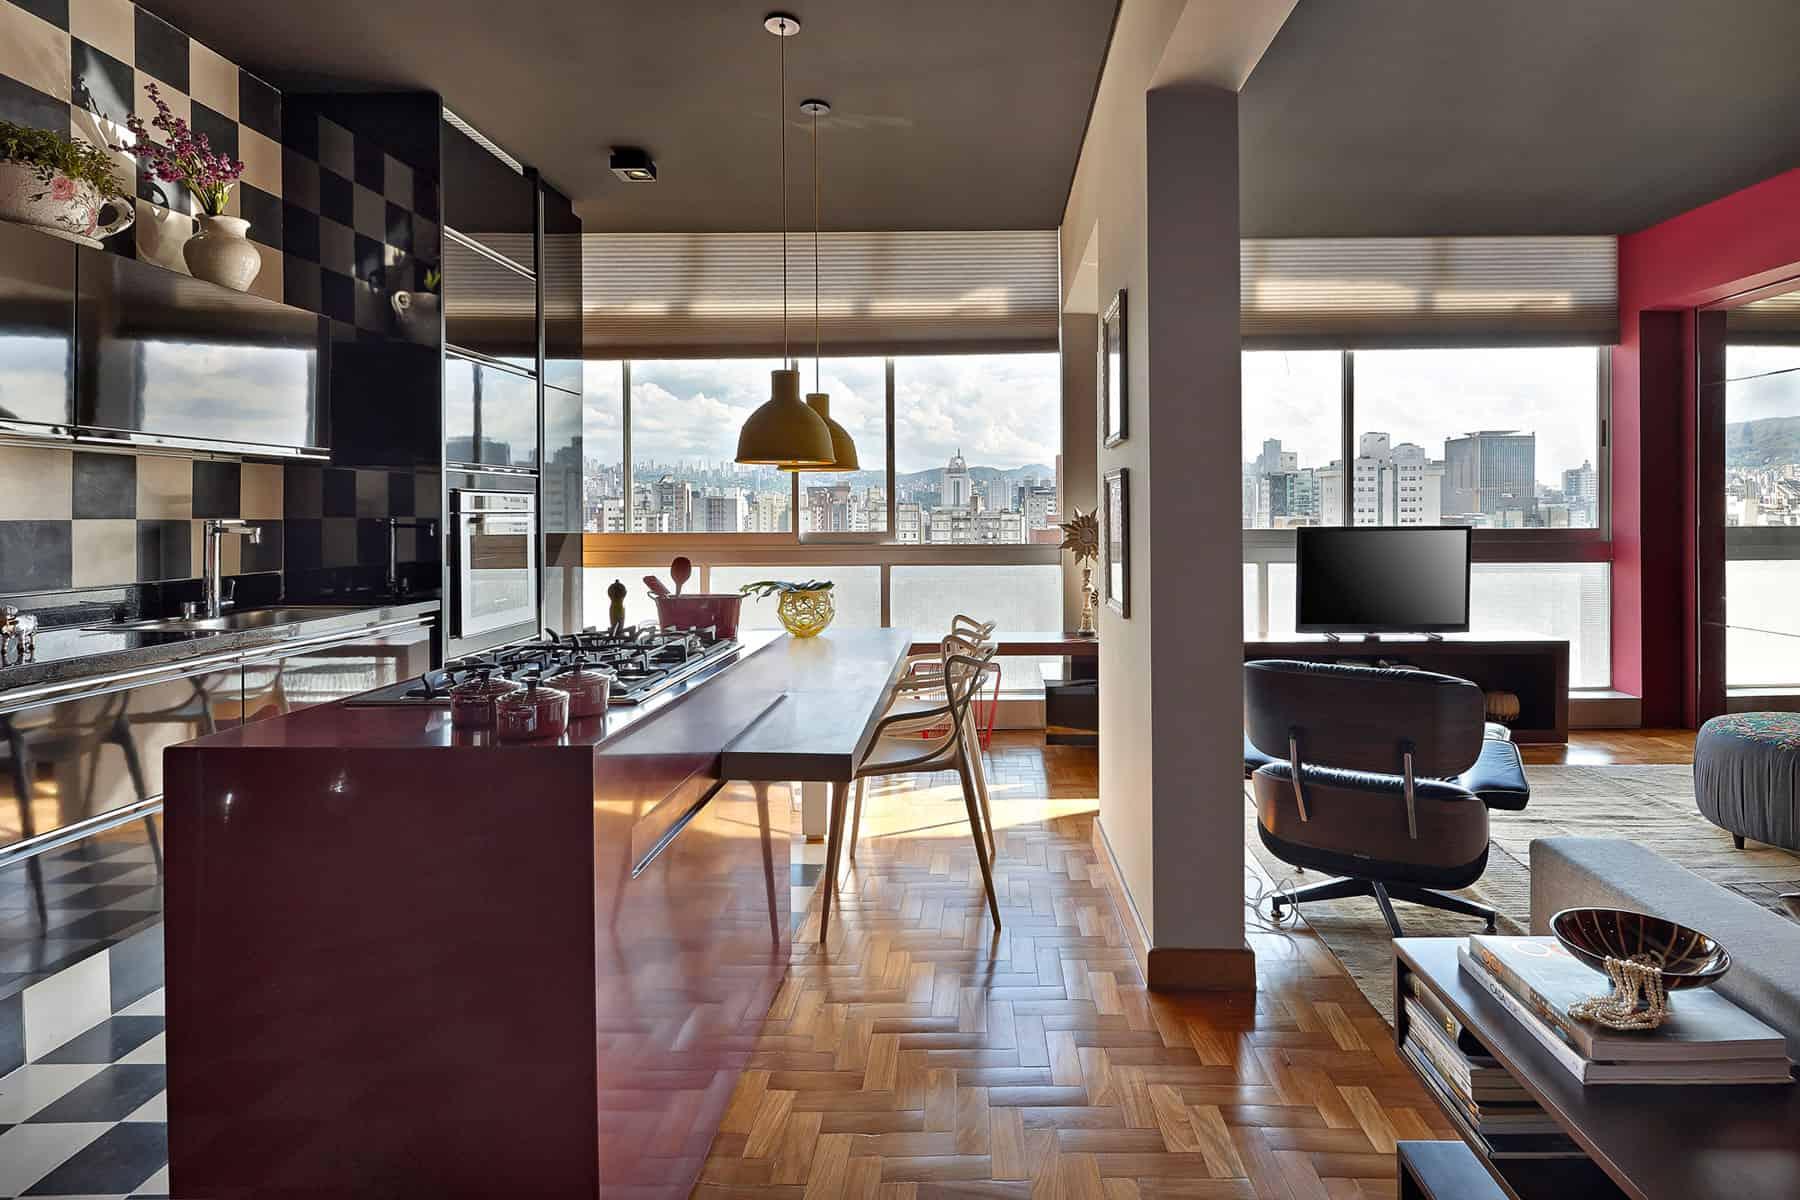 Apartment in Belo Horizonte by Gislene Lopes